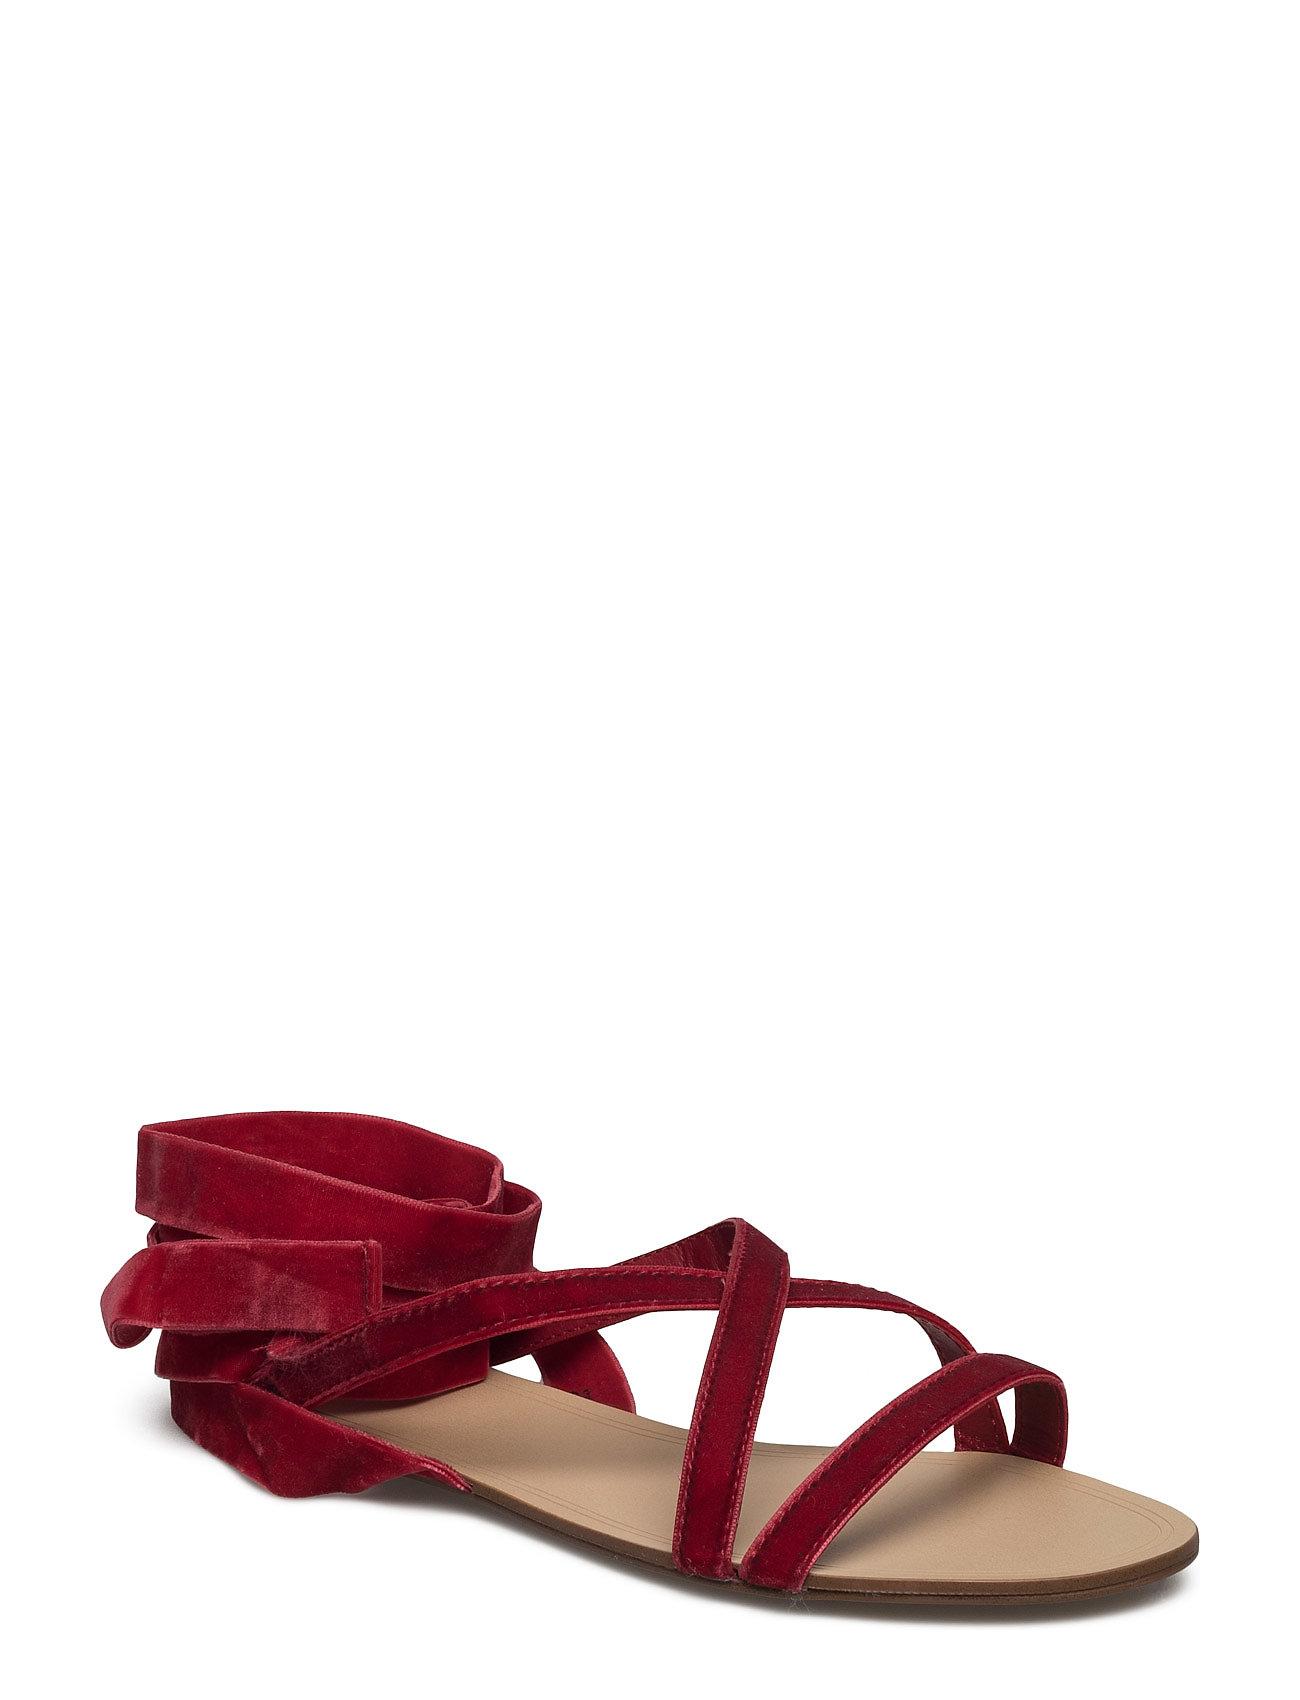 Velvet Strappy Sandals Mango Sandaler til Damer i Mørkerød